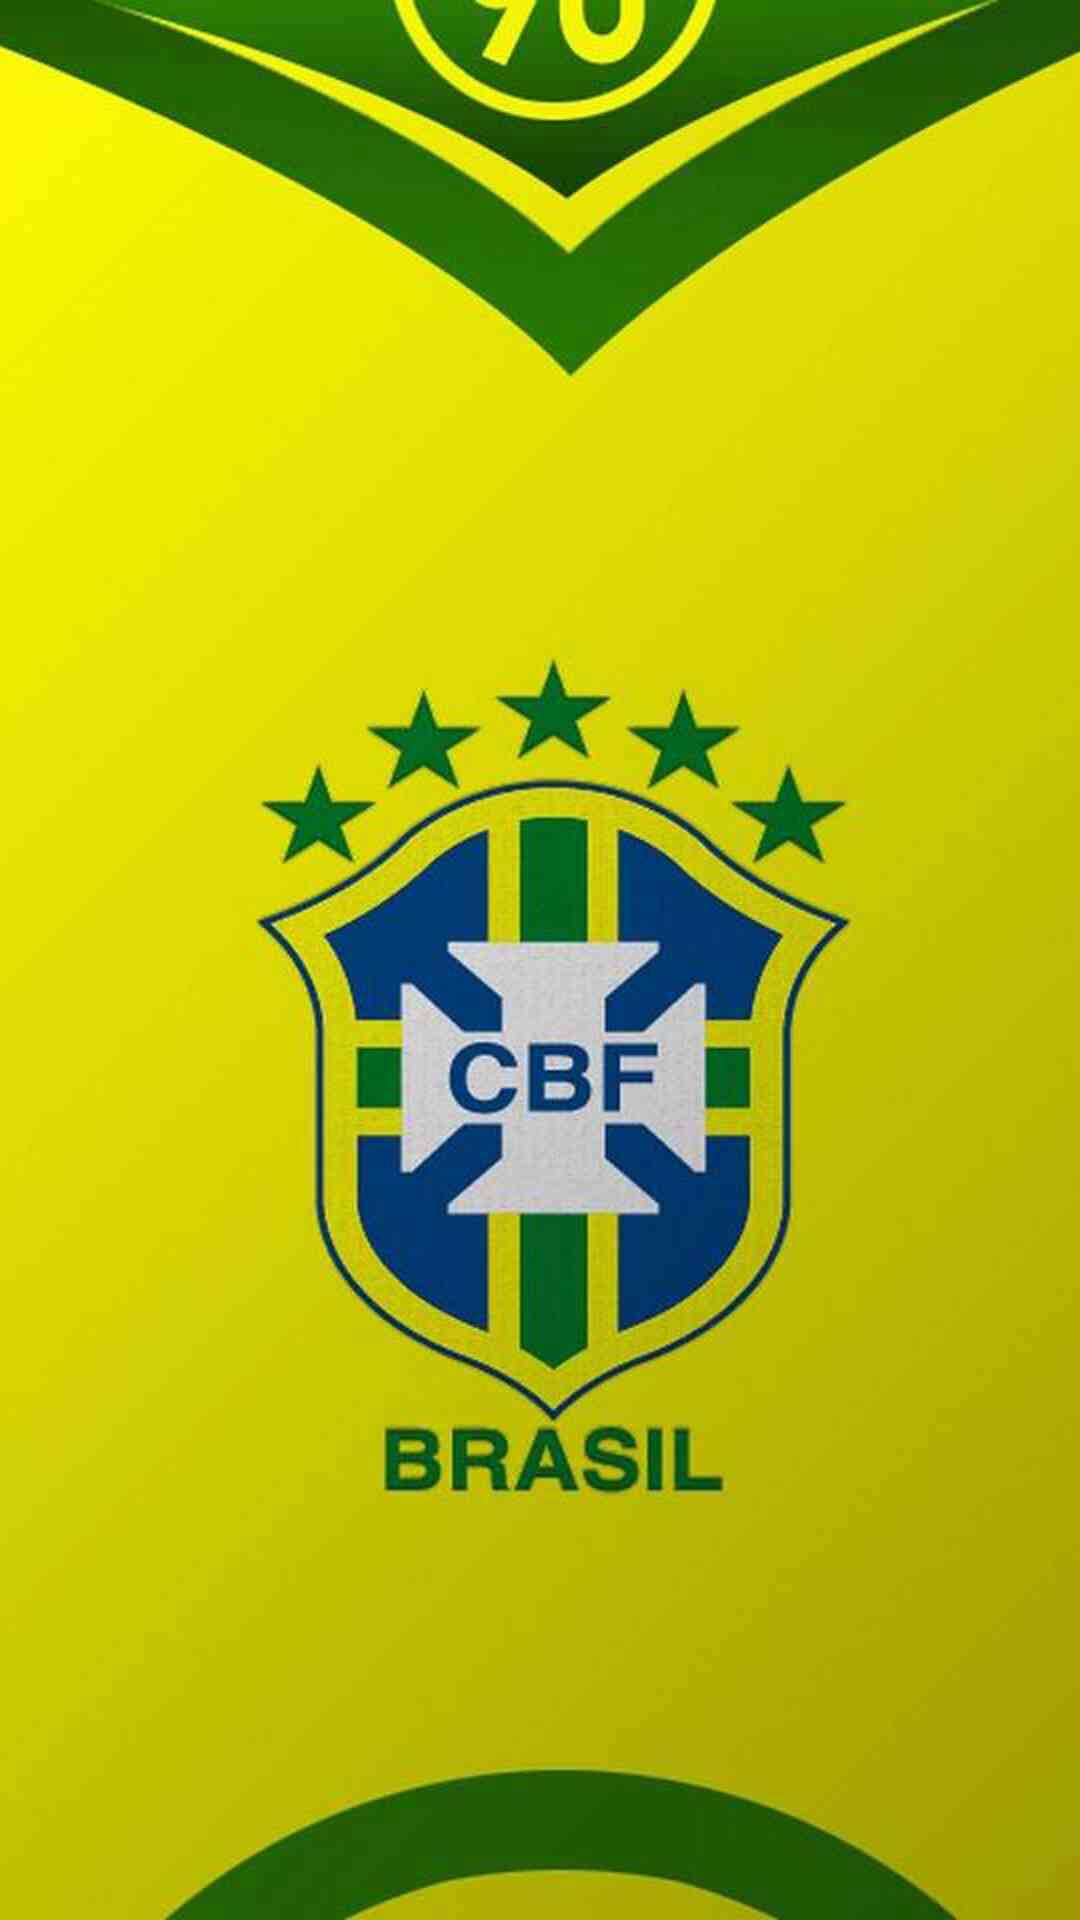 Supreme Wallpaper Iphone X Brazil Flag Wallpaper 69 Images